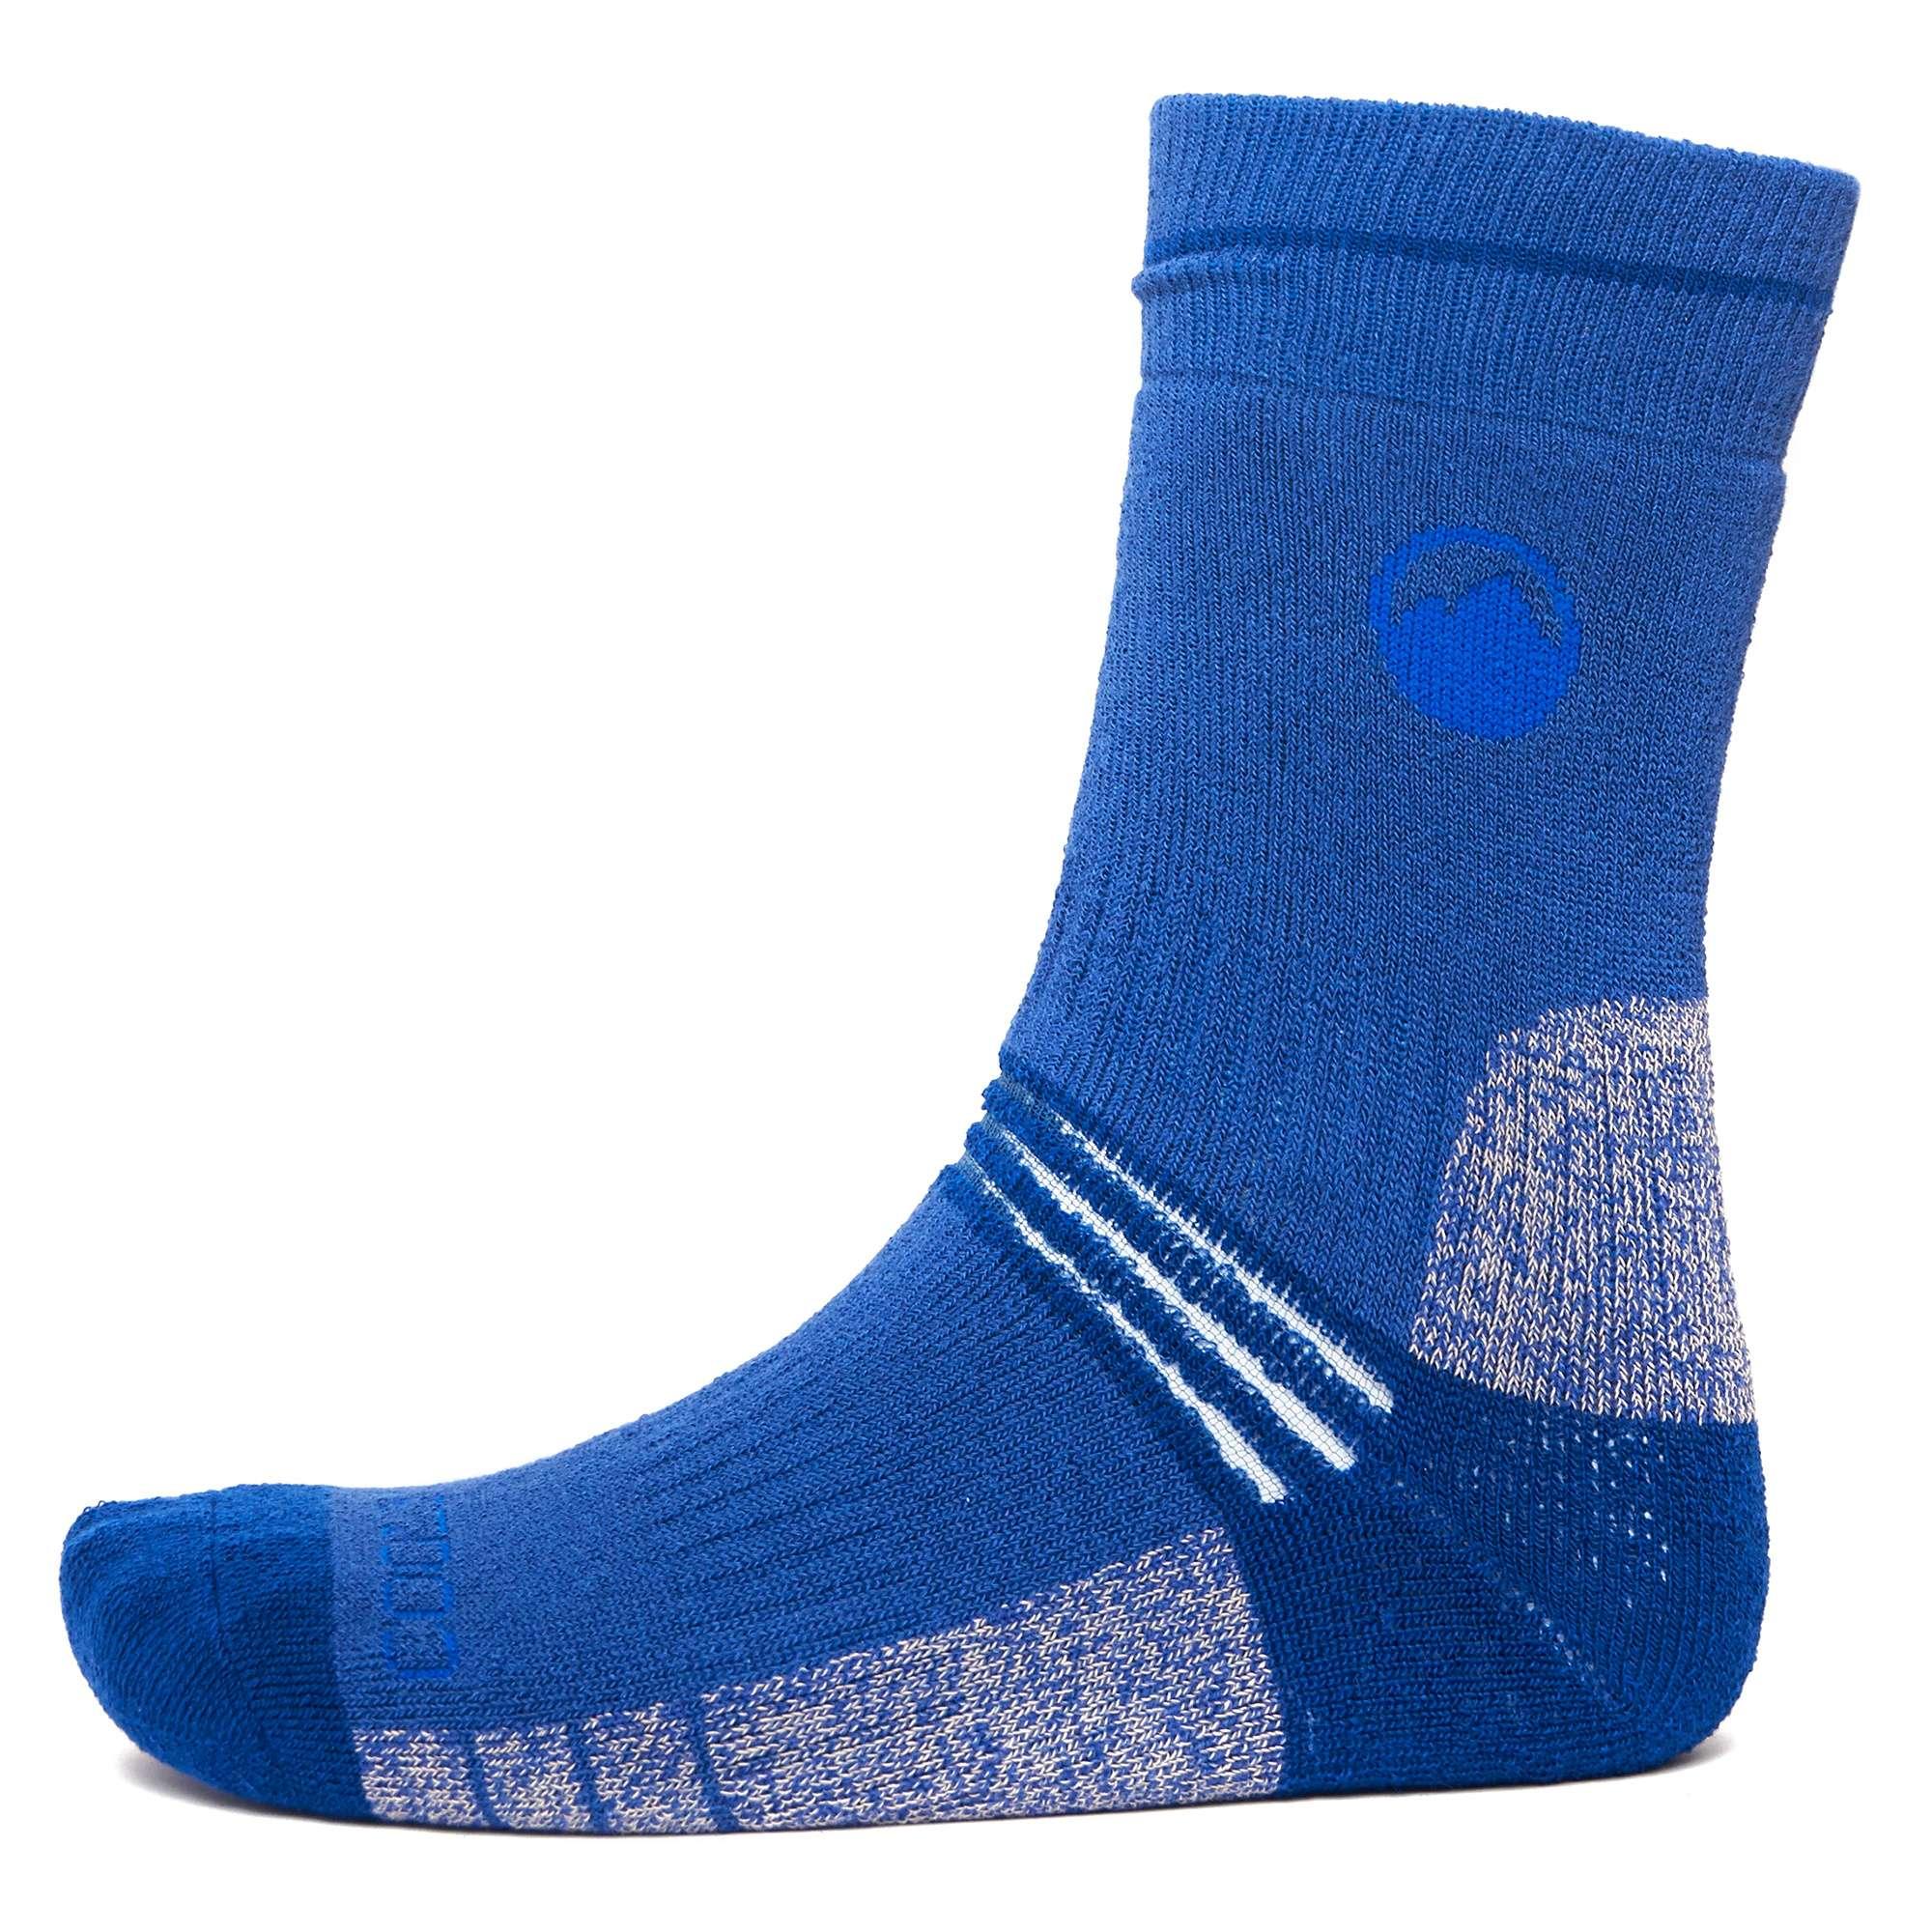 PETER STORM Boy's Midweight Outdoor Socks